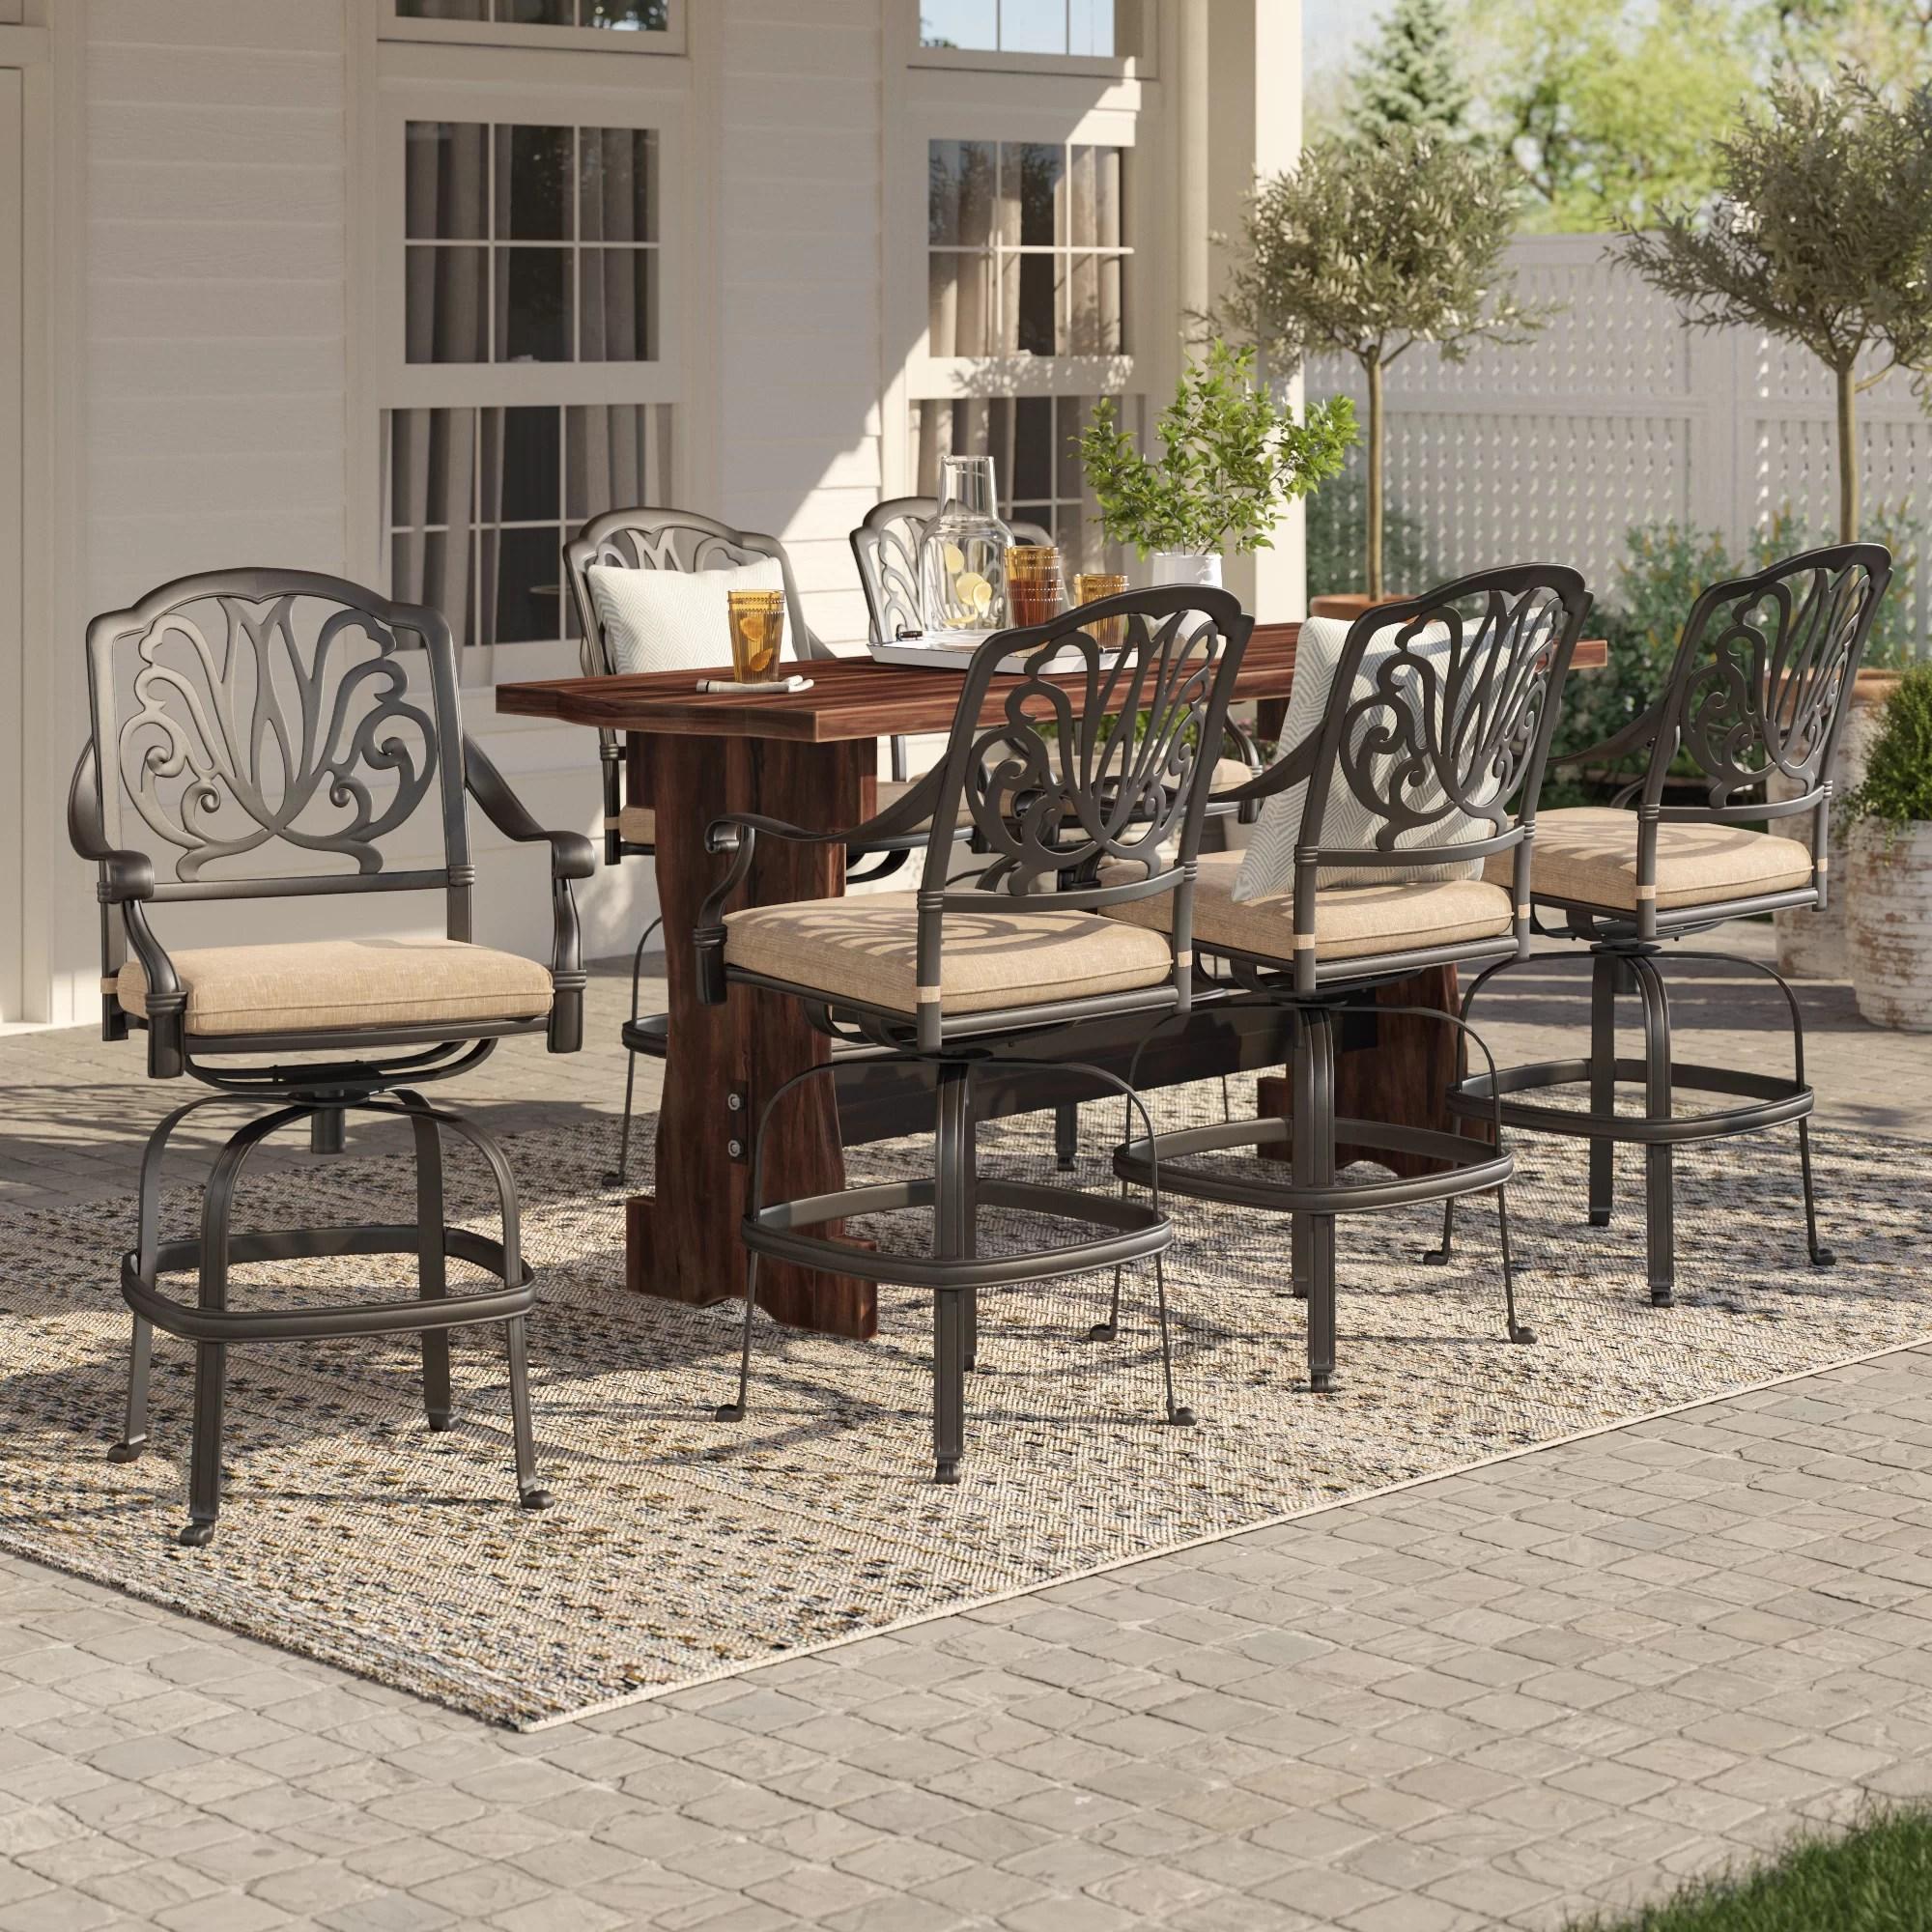 lebanon swivel 29 patio bar stool with cushion